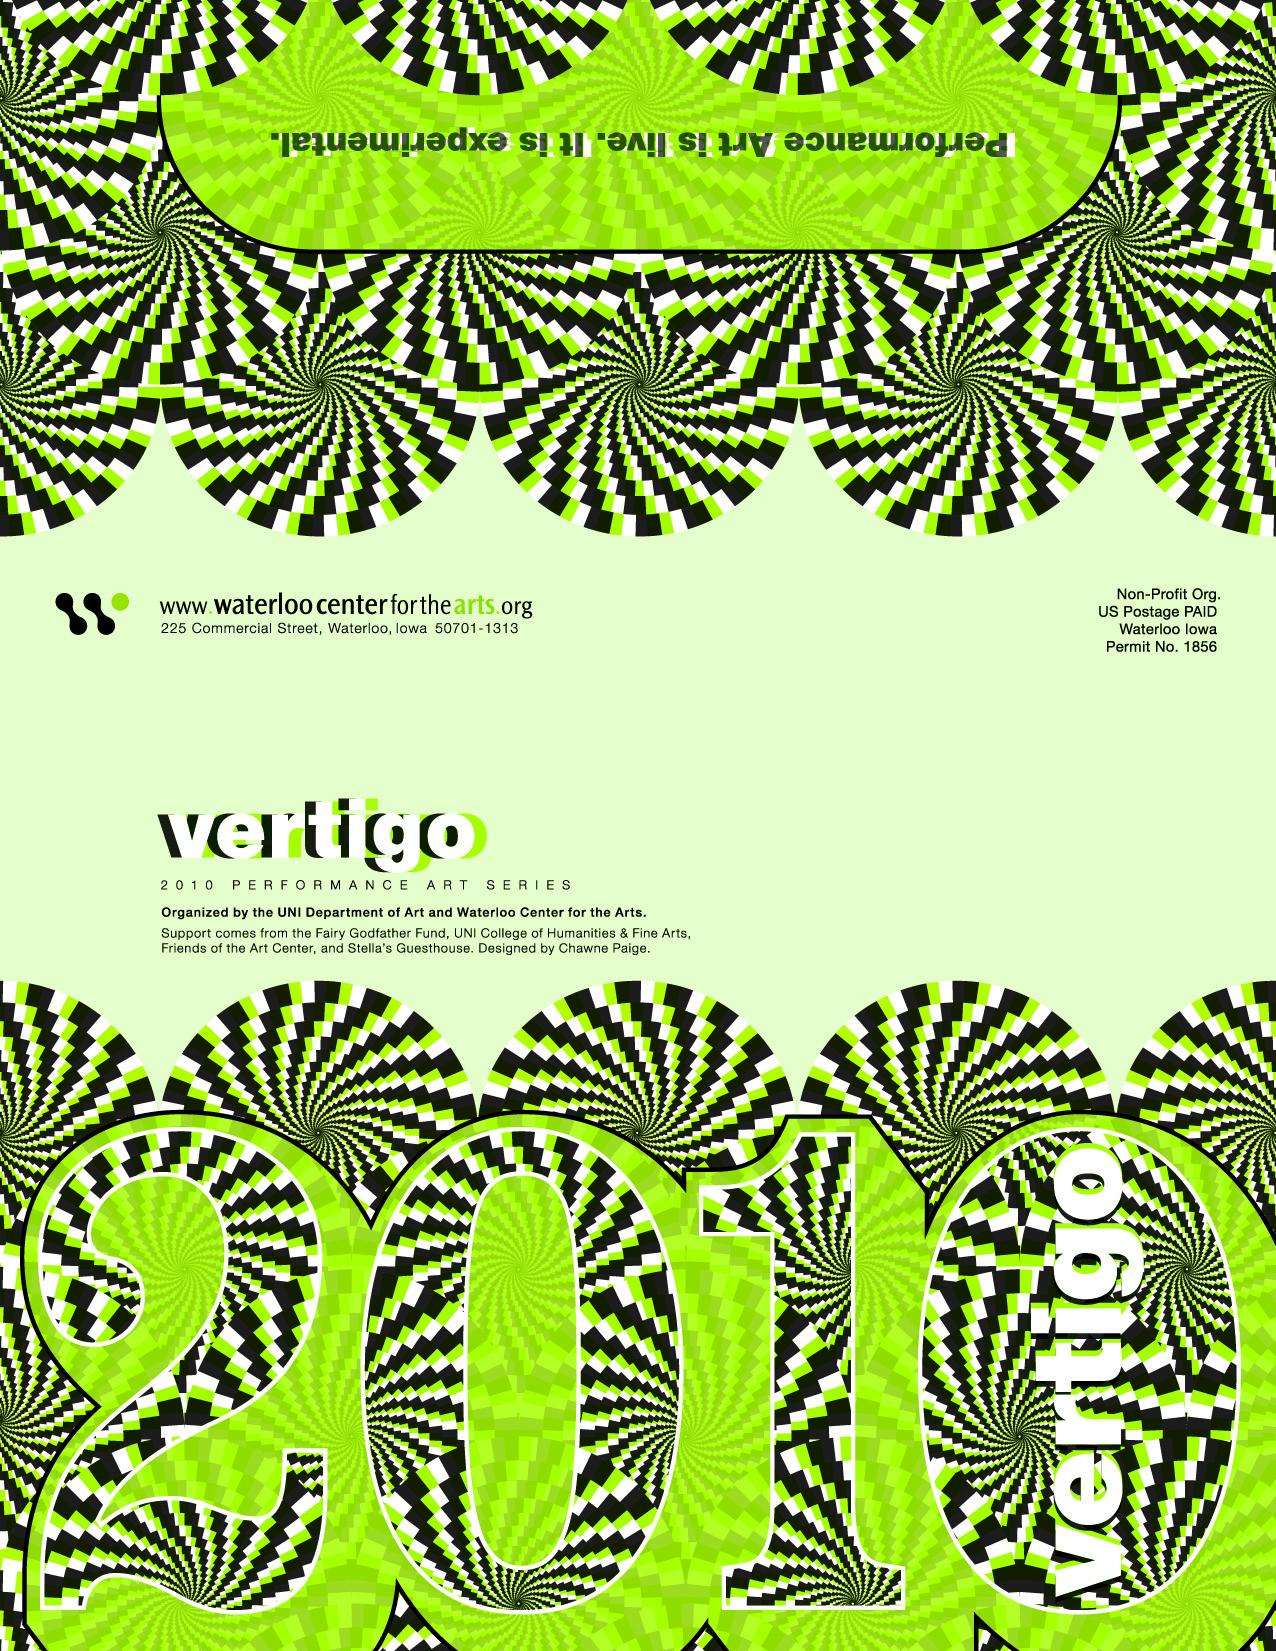 Veritgo 2010, Performance Art Series Poster (side2)